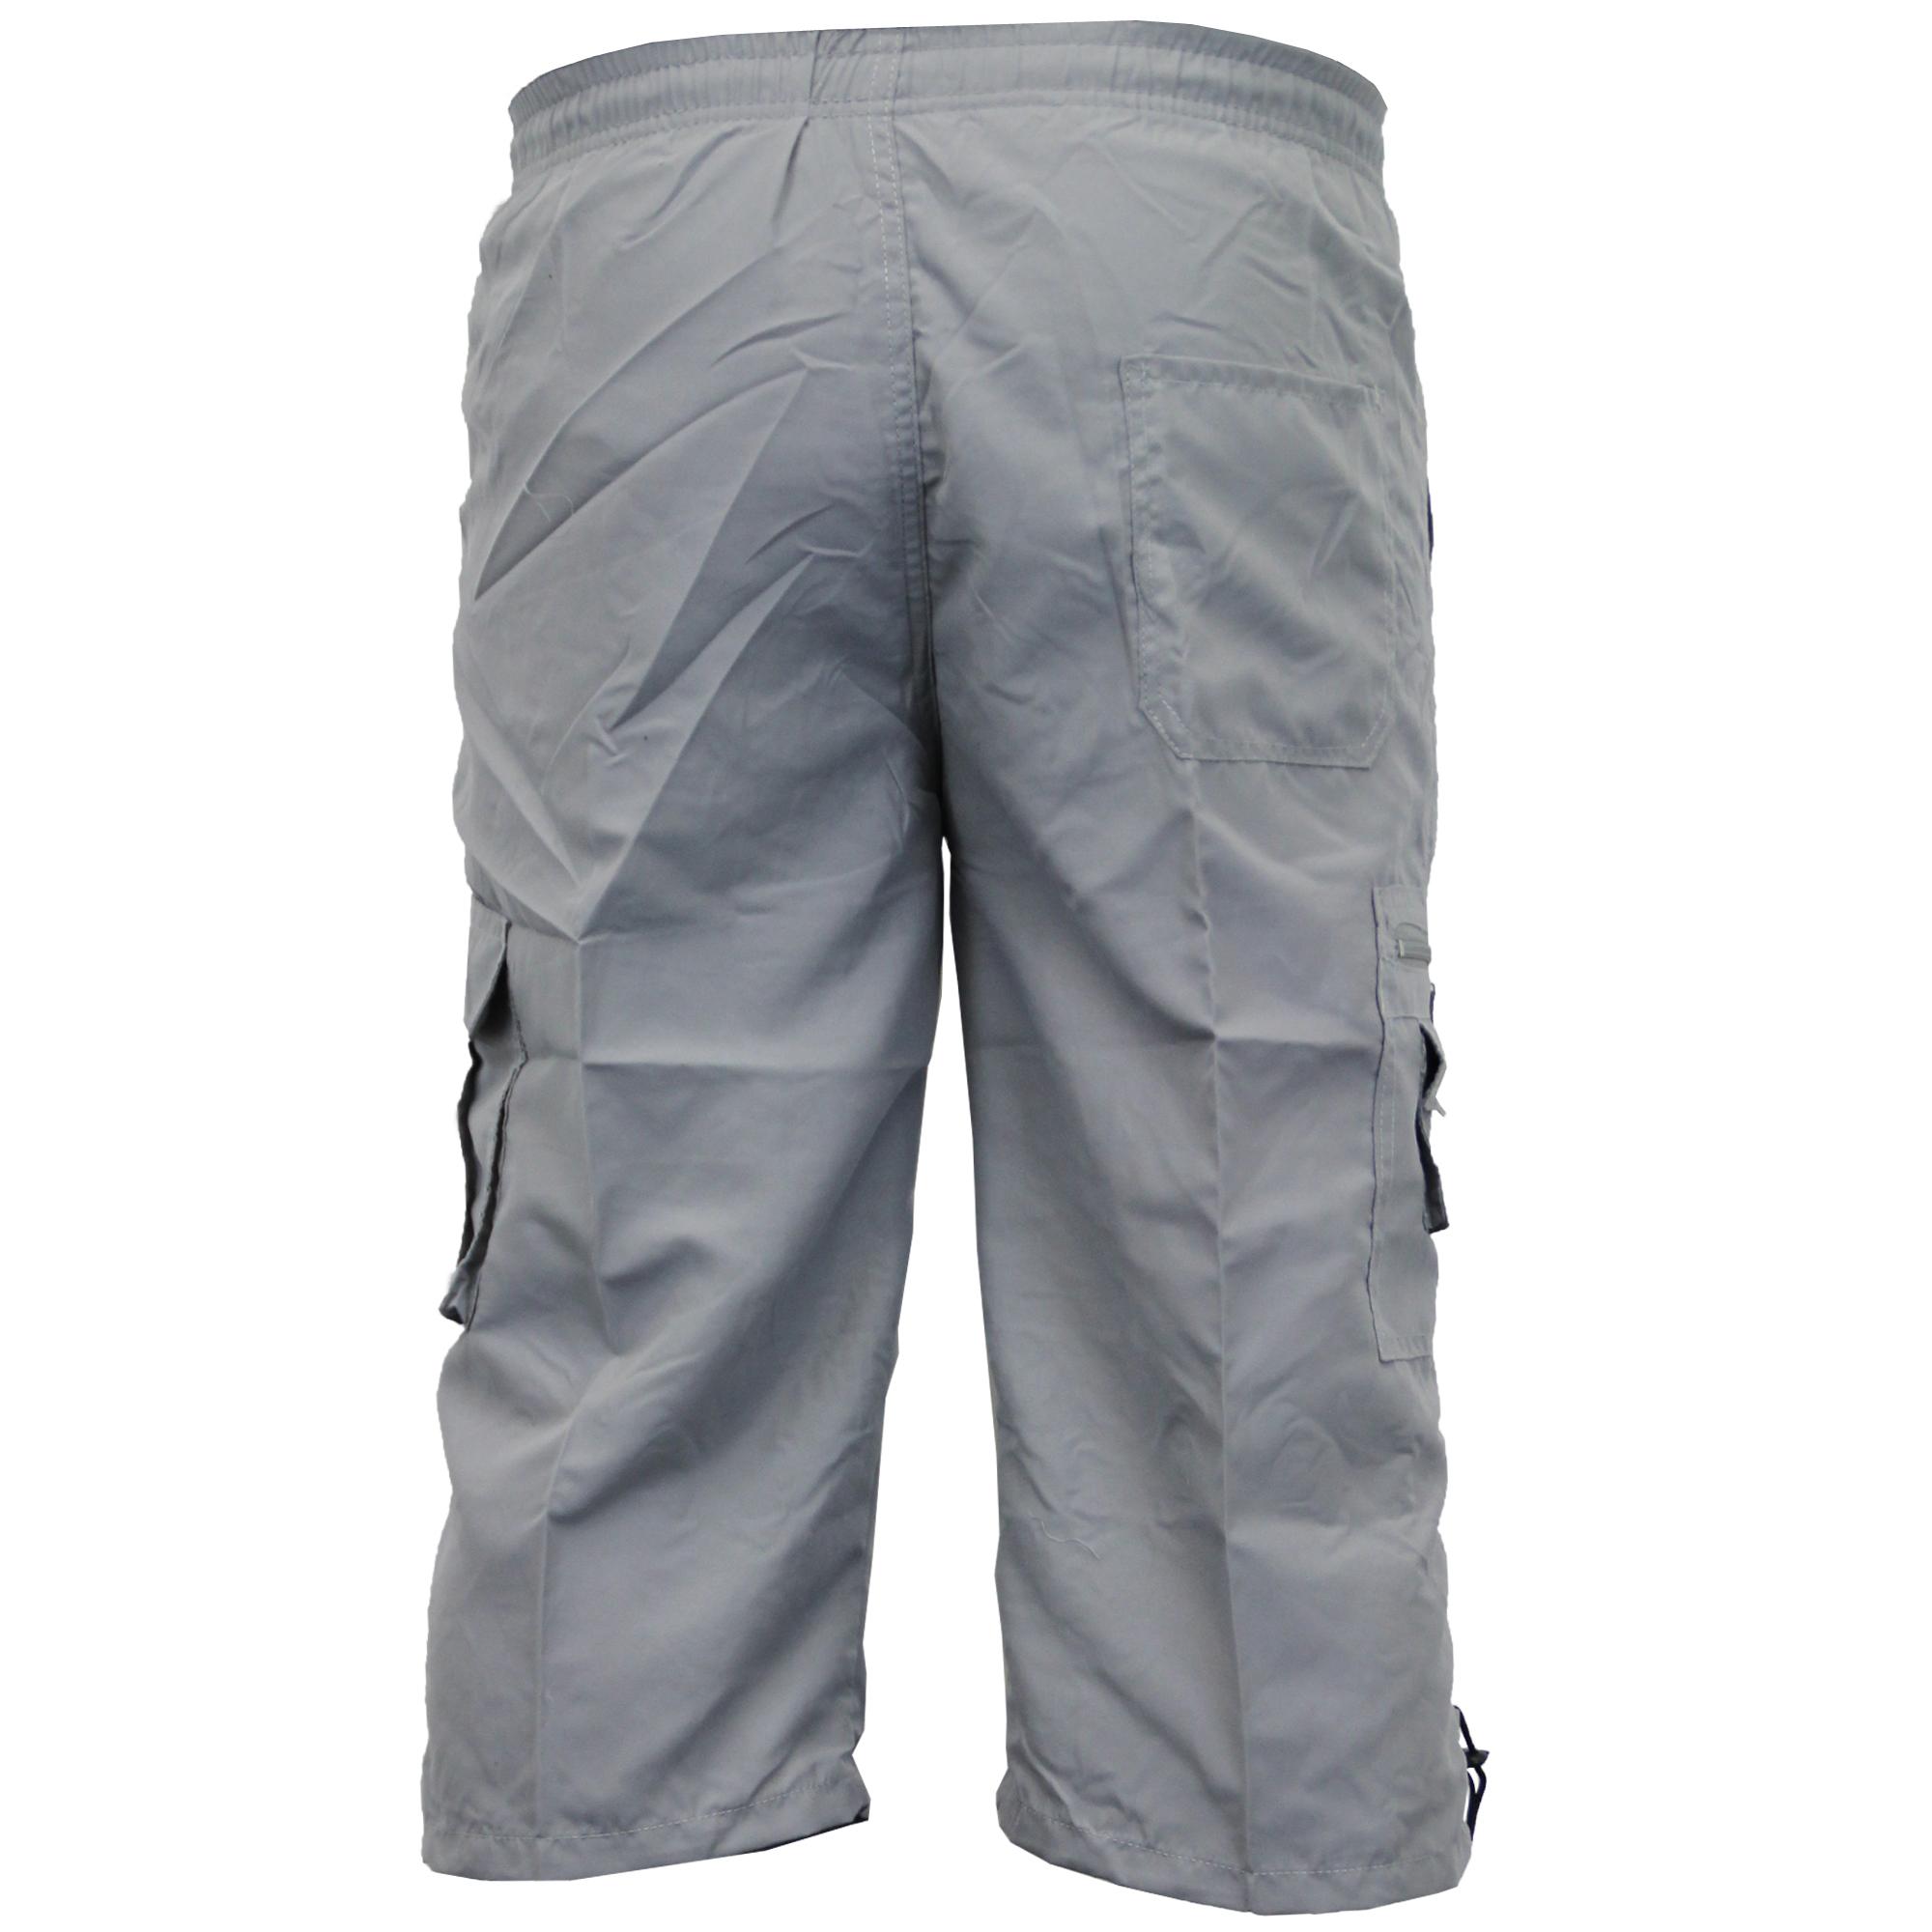 Mens-Combat-Cargo-Shorts-3-4-Length-Plain-Sport-Fashion-Casual-Summer-New thumbnail 9